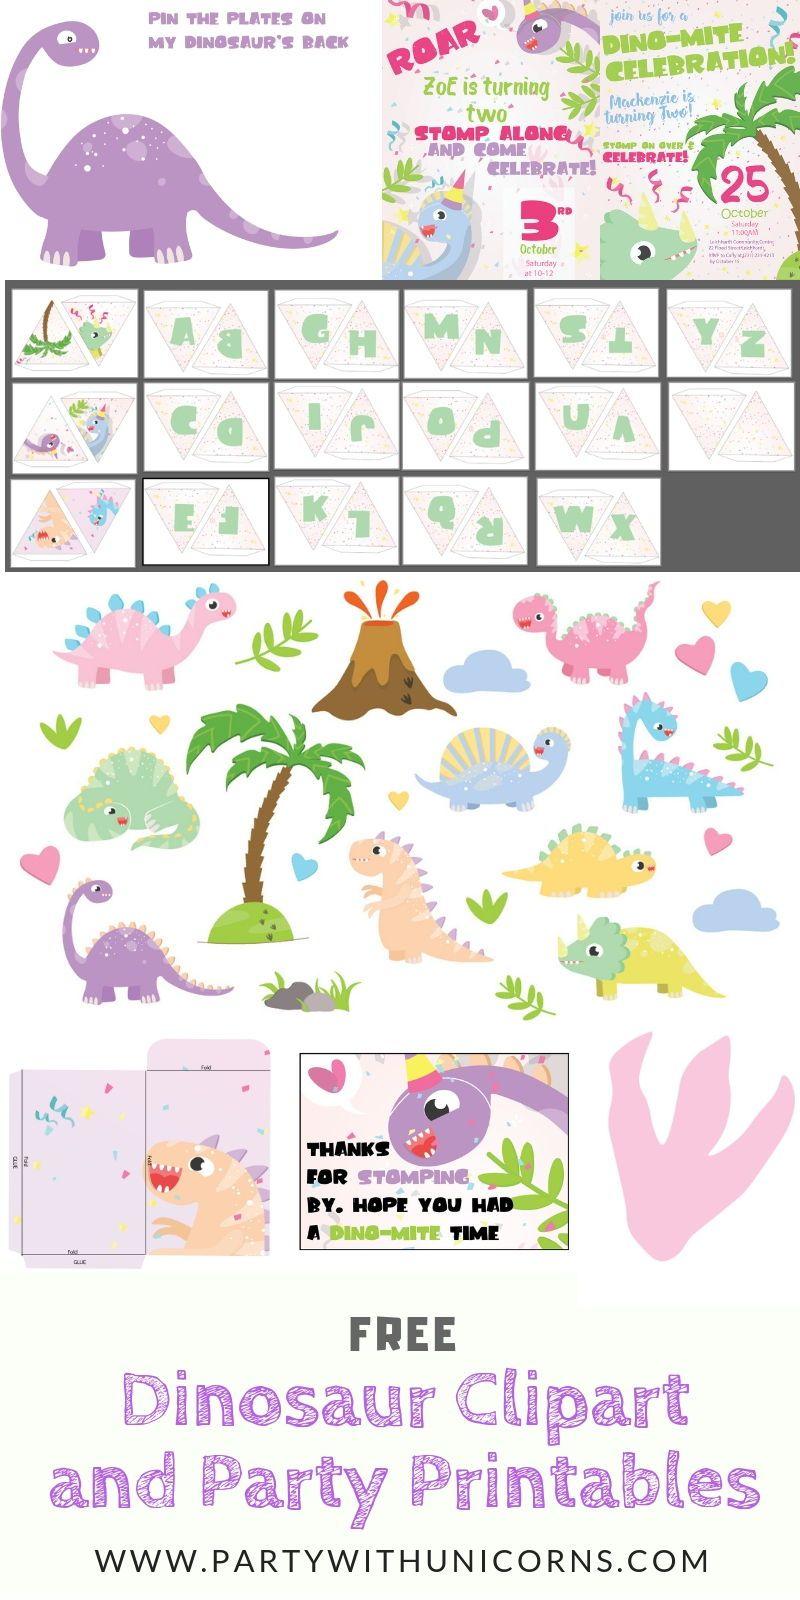 medium resolution of free dinosaur clipart and party printables dinosaurs dinosaurparty dino